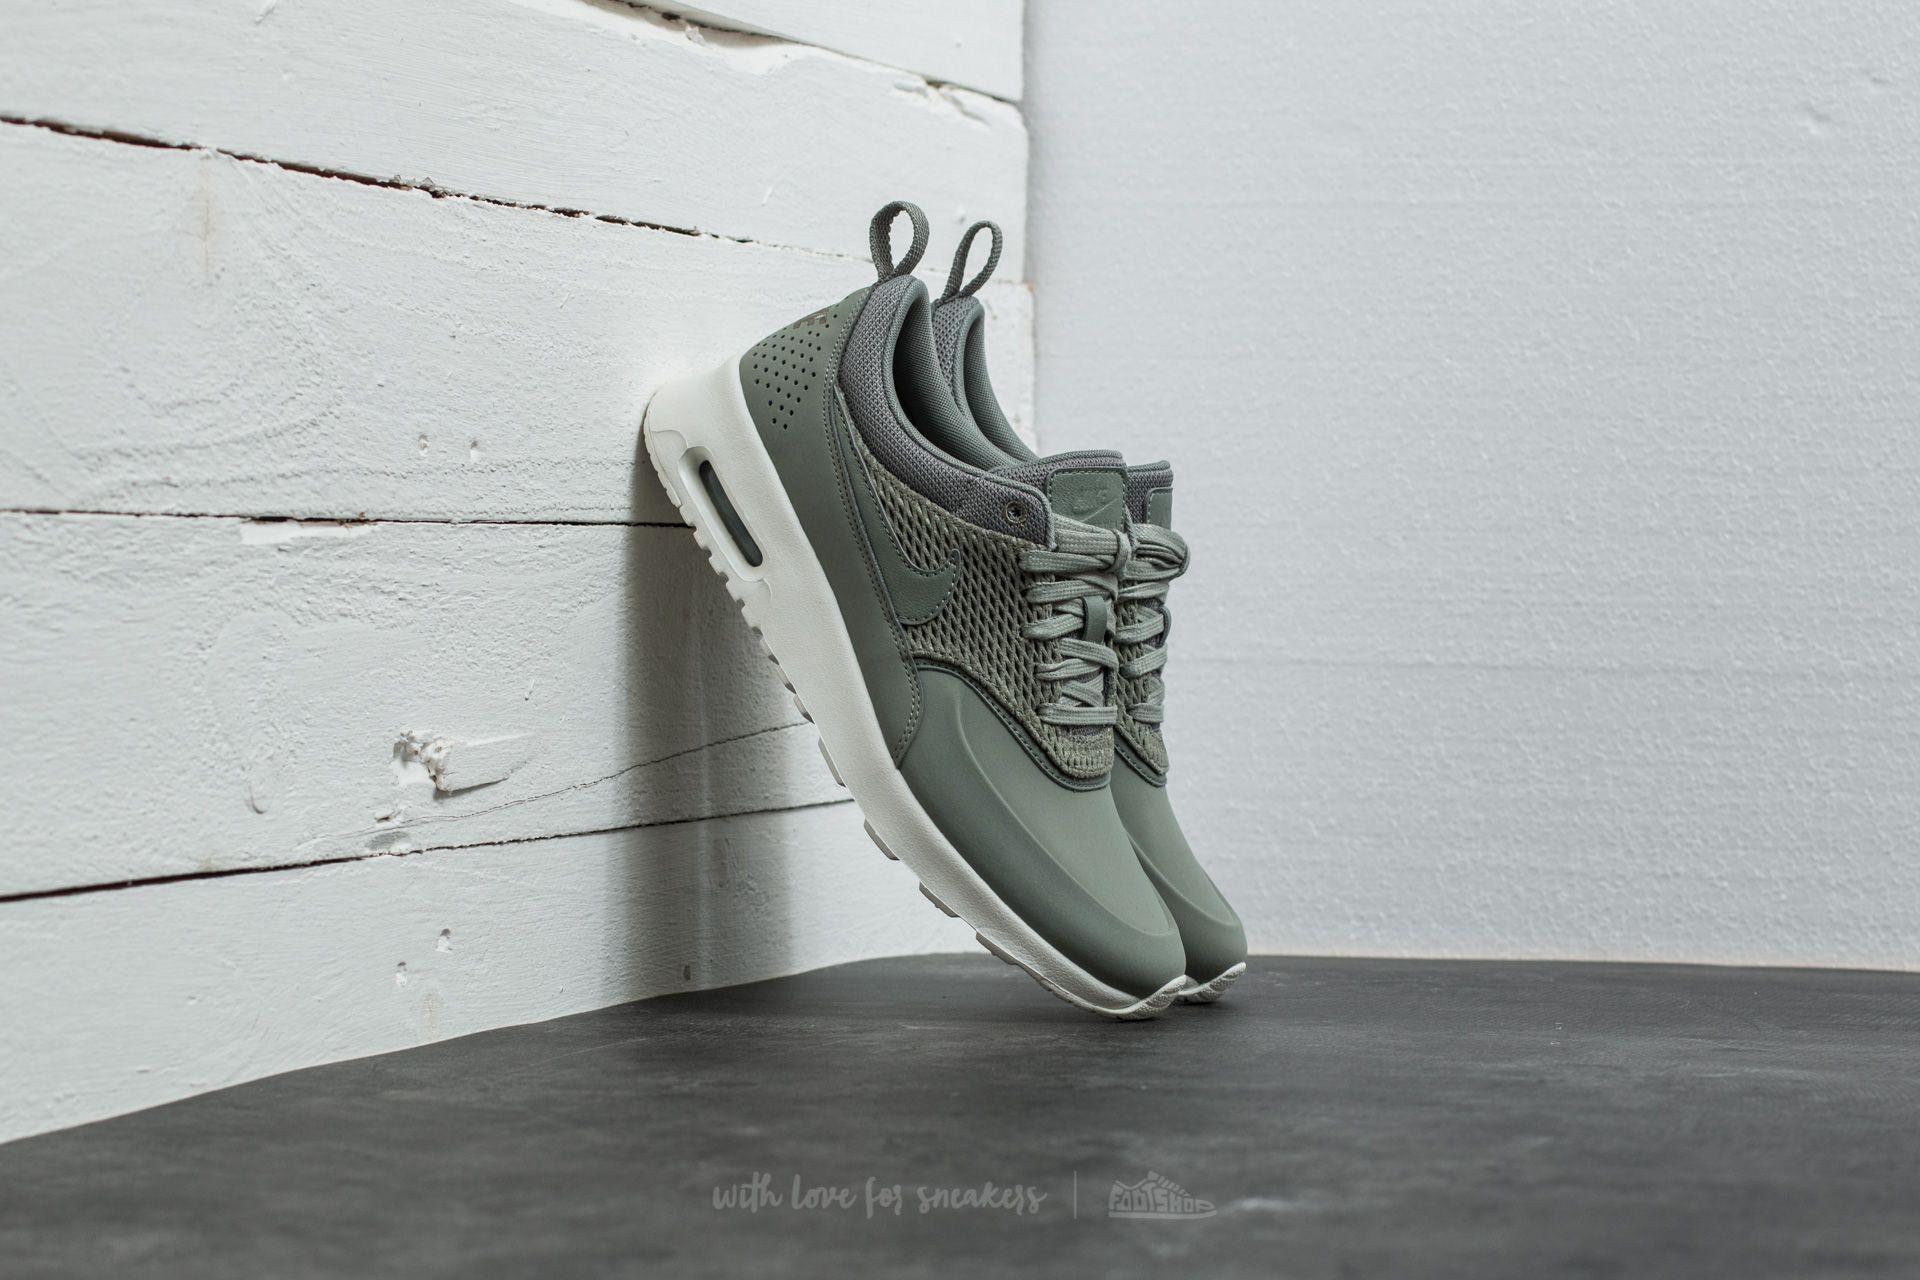 ce097ebb40 Nike Wmns Air Max Thea Premium Leather Dark Stucco/ Dark Stucco ...